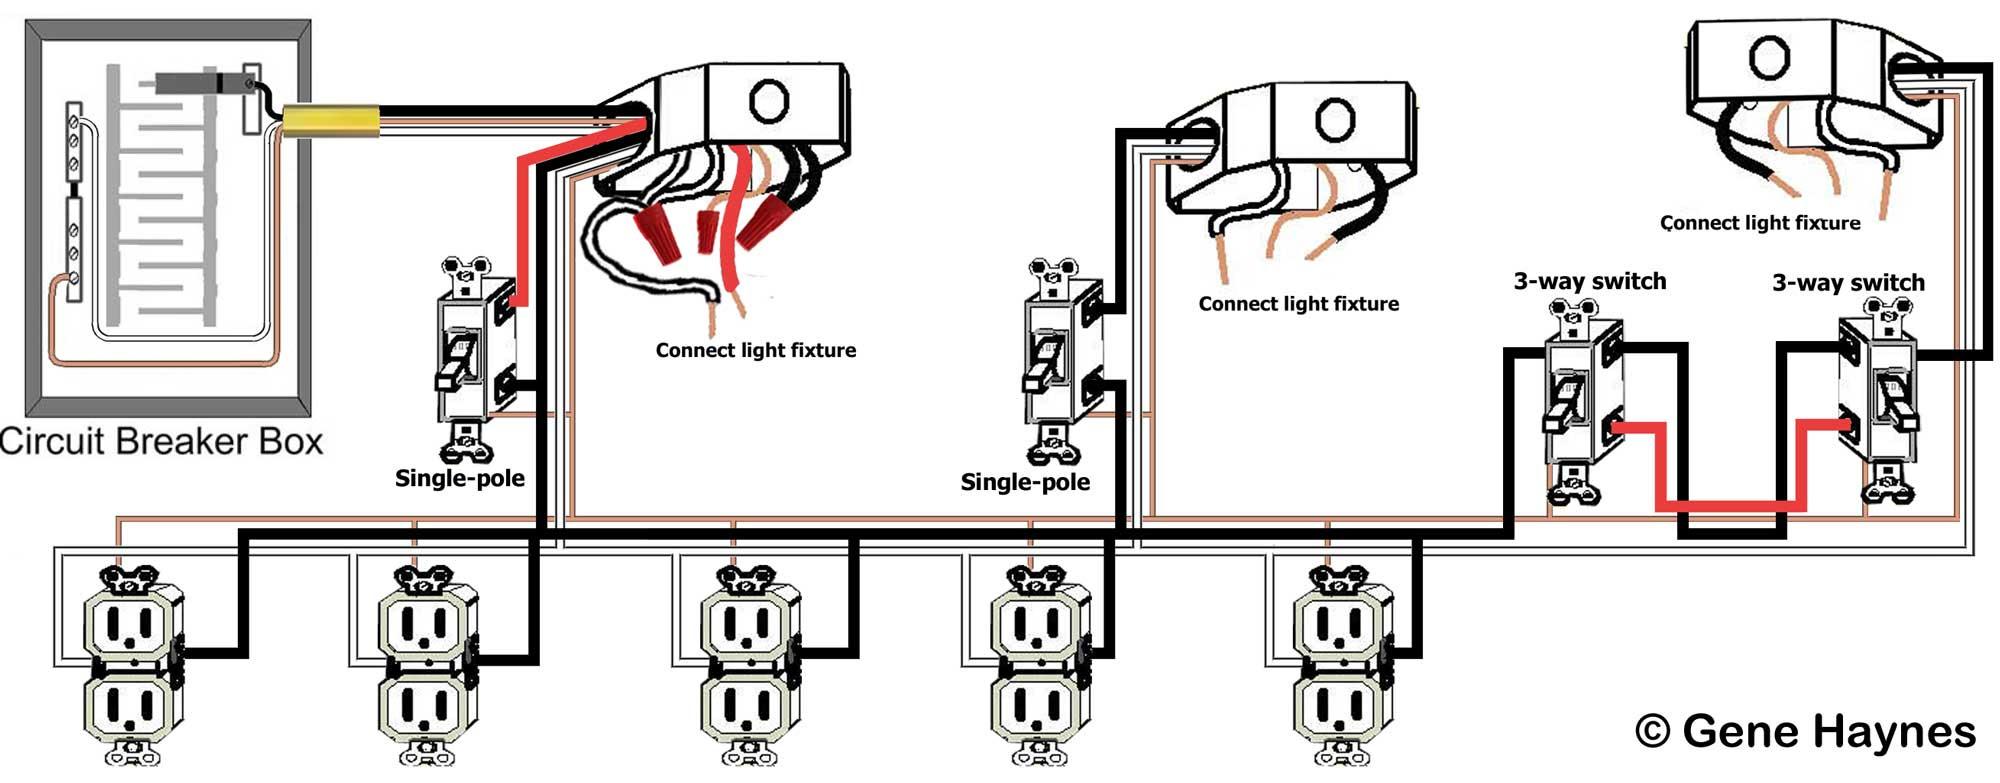 110 House Wiring Diagram Of Surface 2 Begeboy Wiring Diagram Source